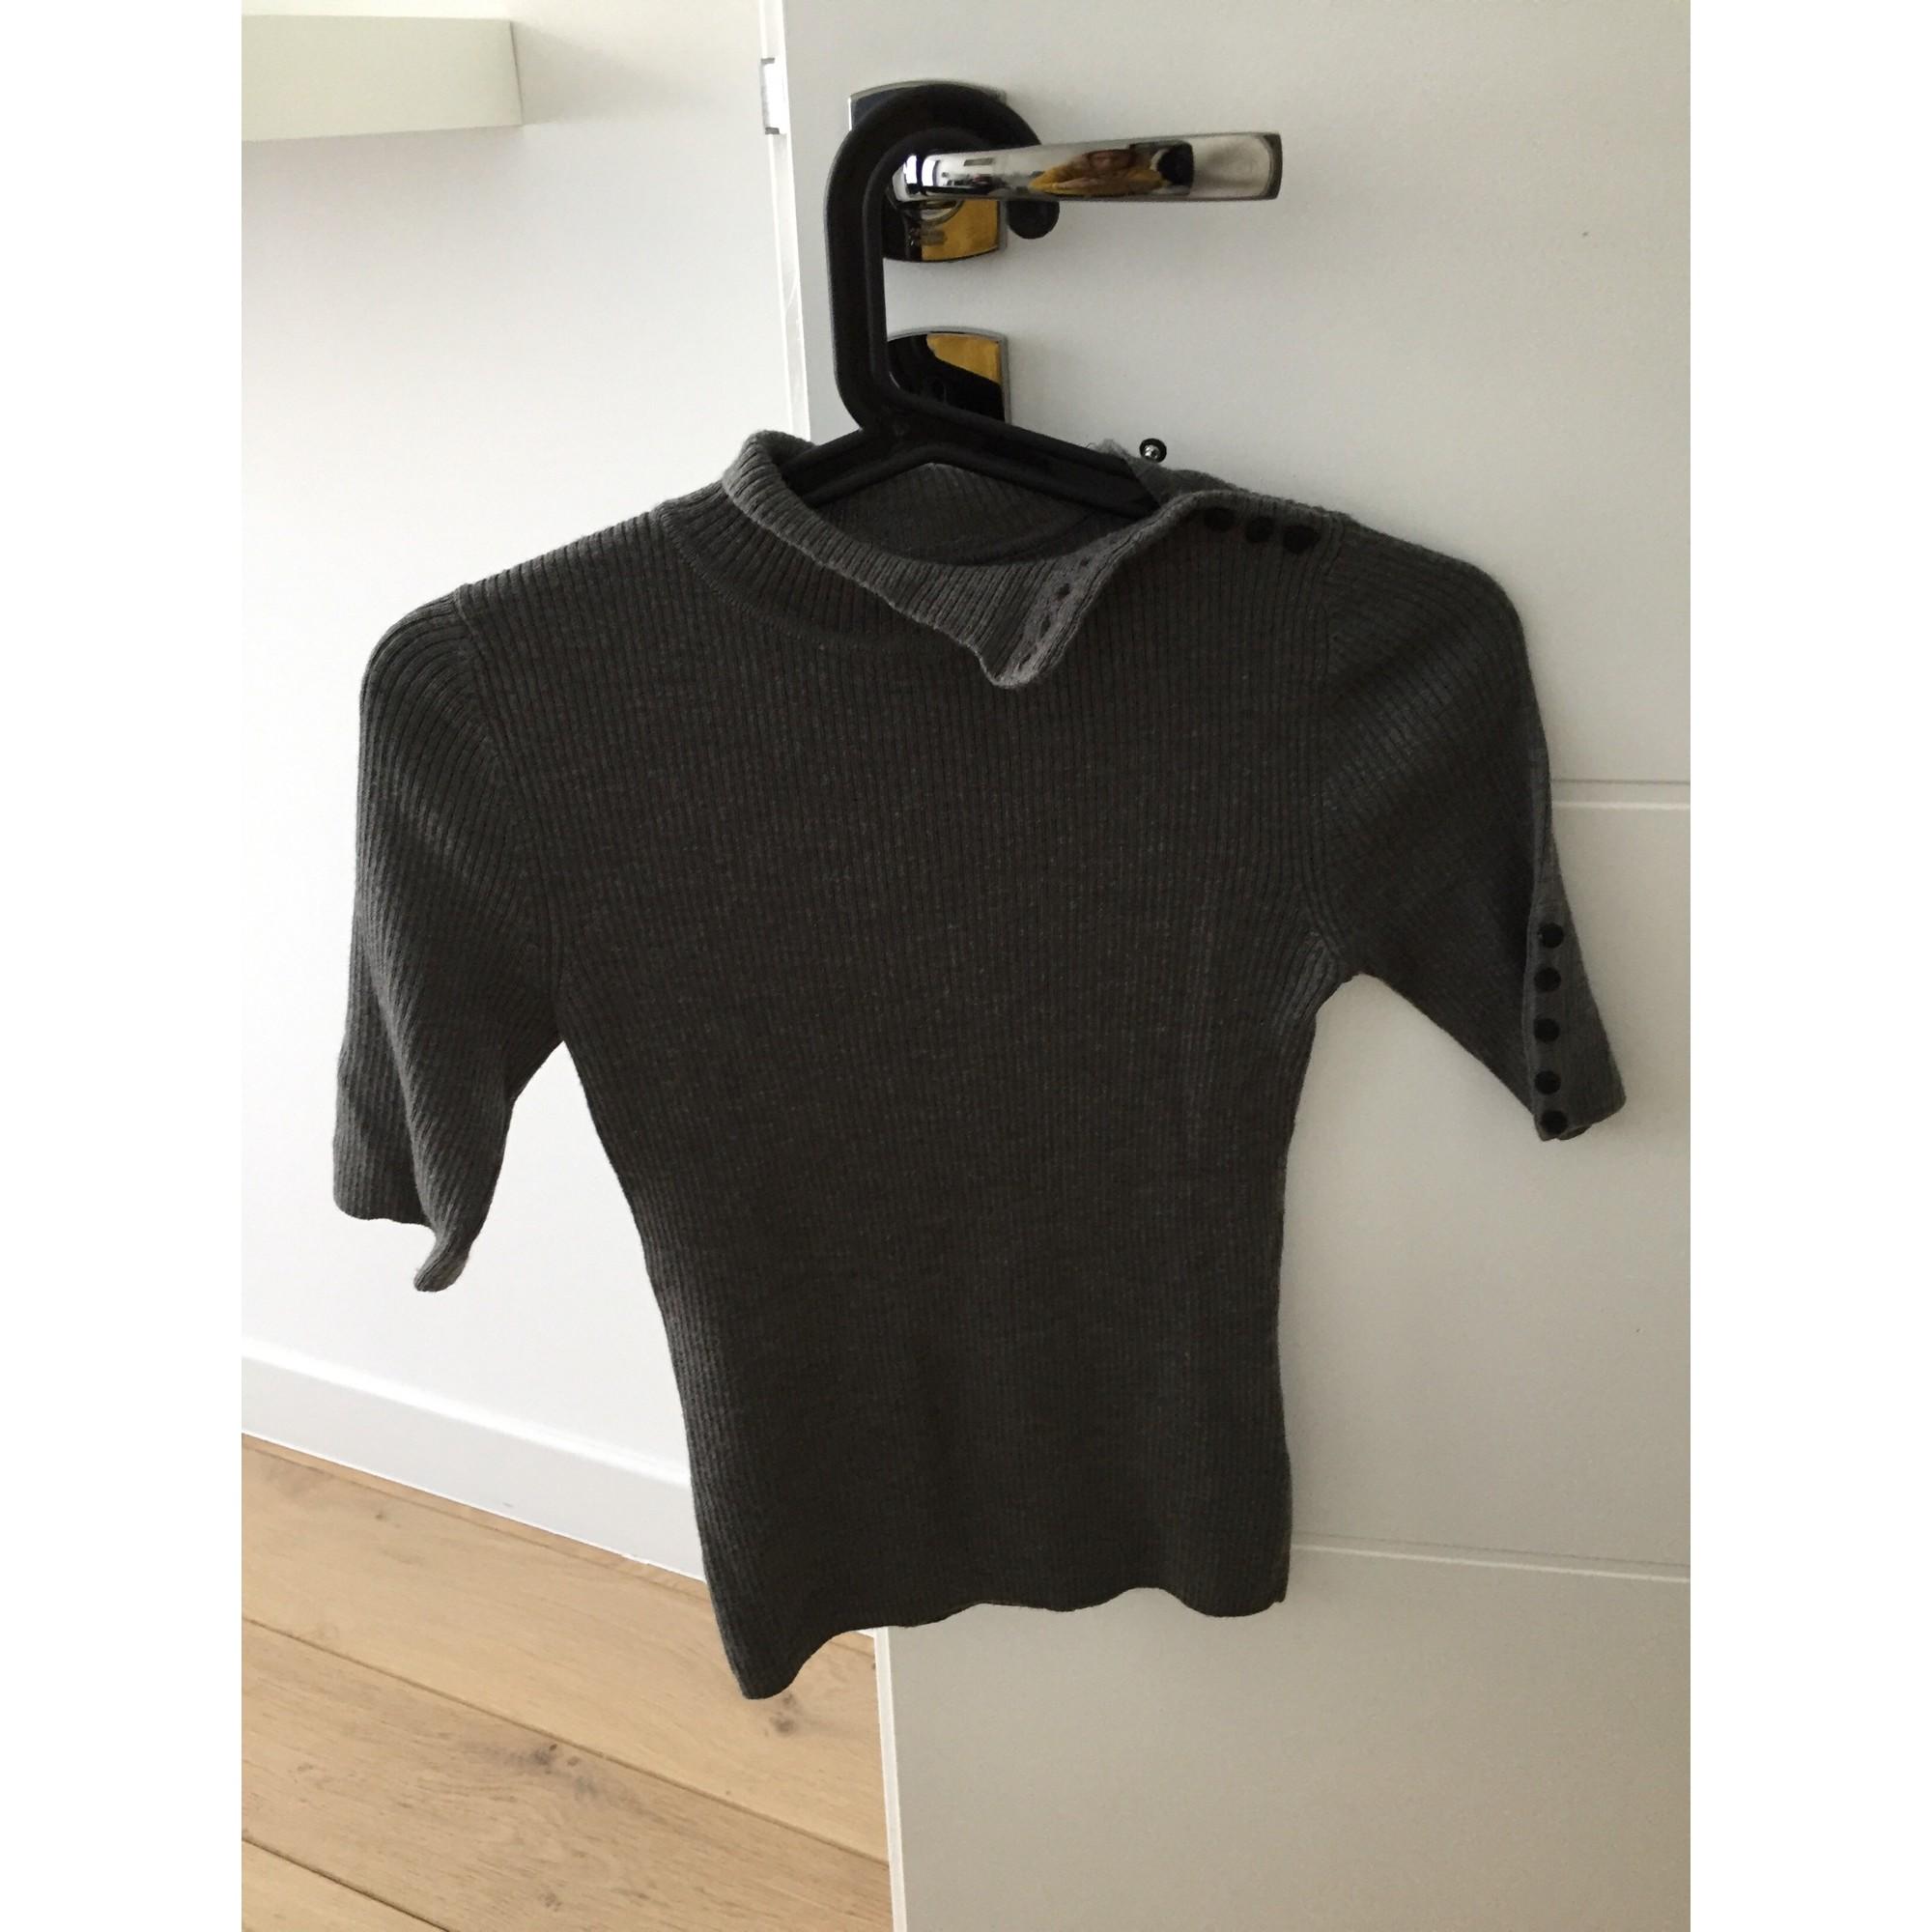 Top, tee-shirt CAROLL Gris, anthracite